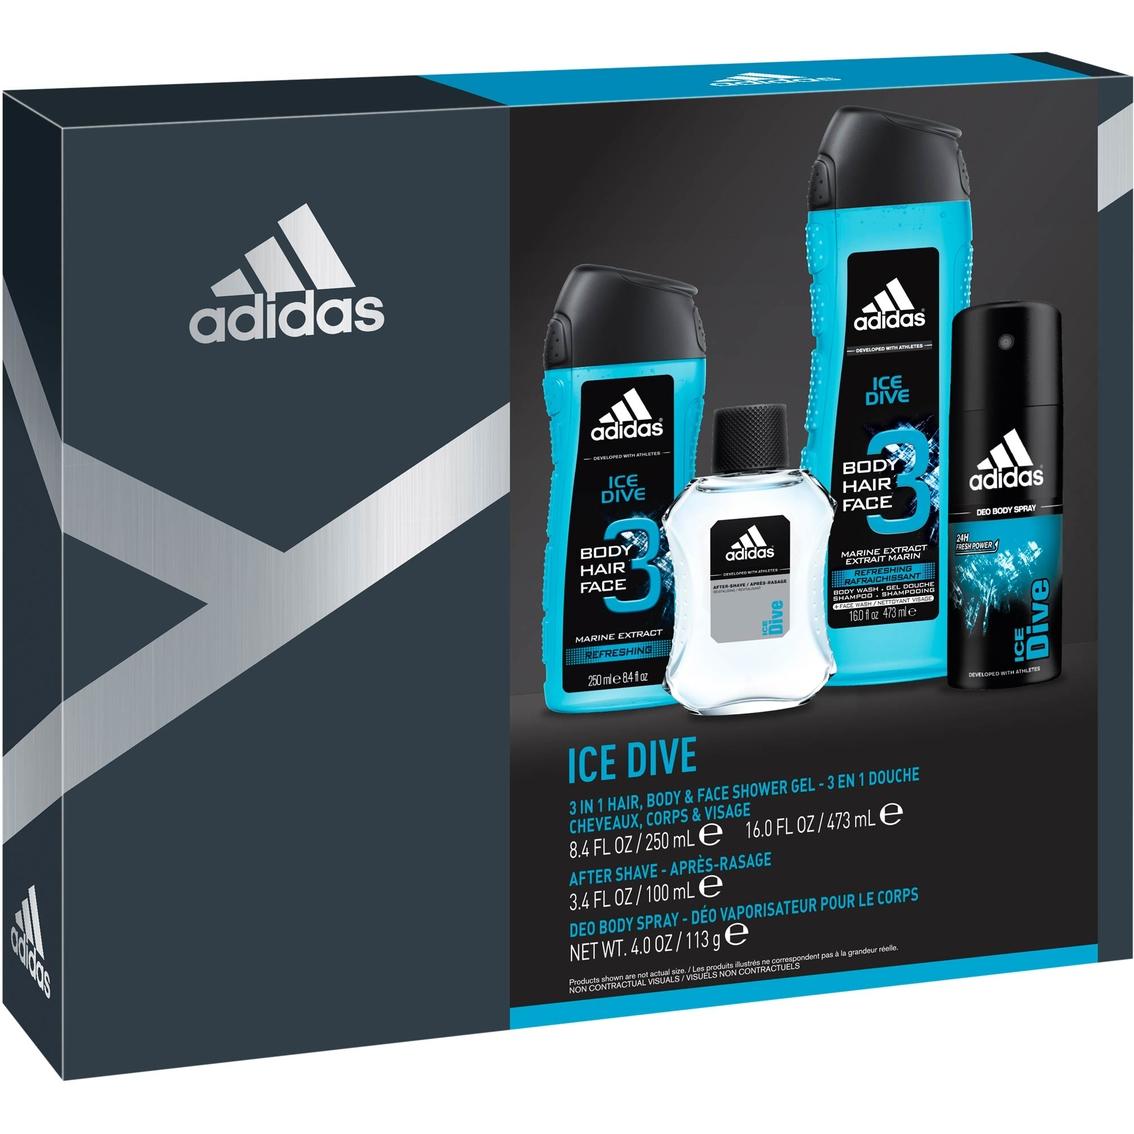 36cba0b6c68c Adidas Ice Dive Gift Set 4 Pc.